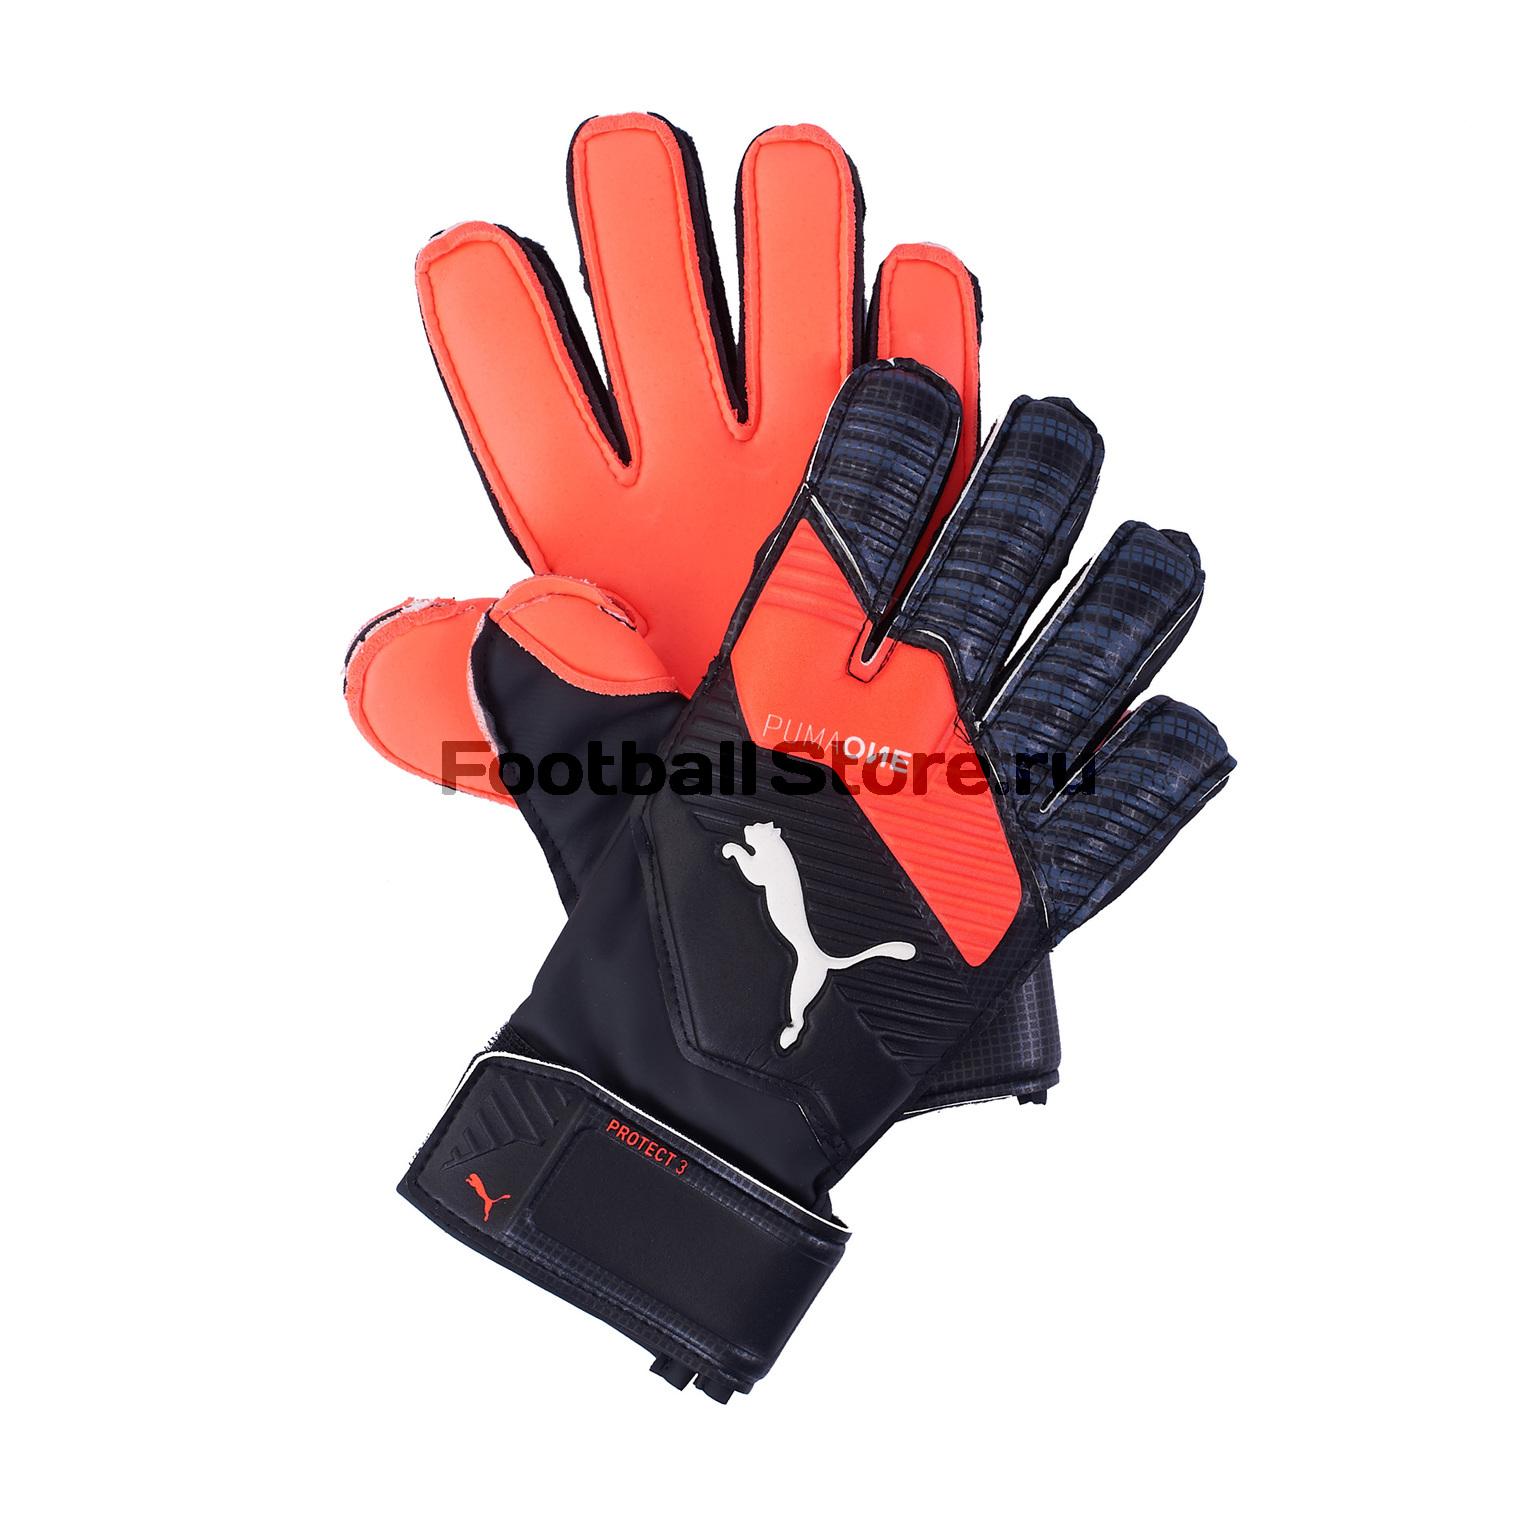 Перчатки вратарские Puma One Protect 3 JR 04163601